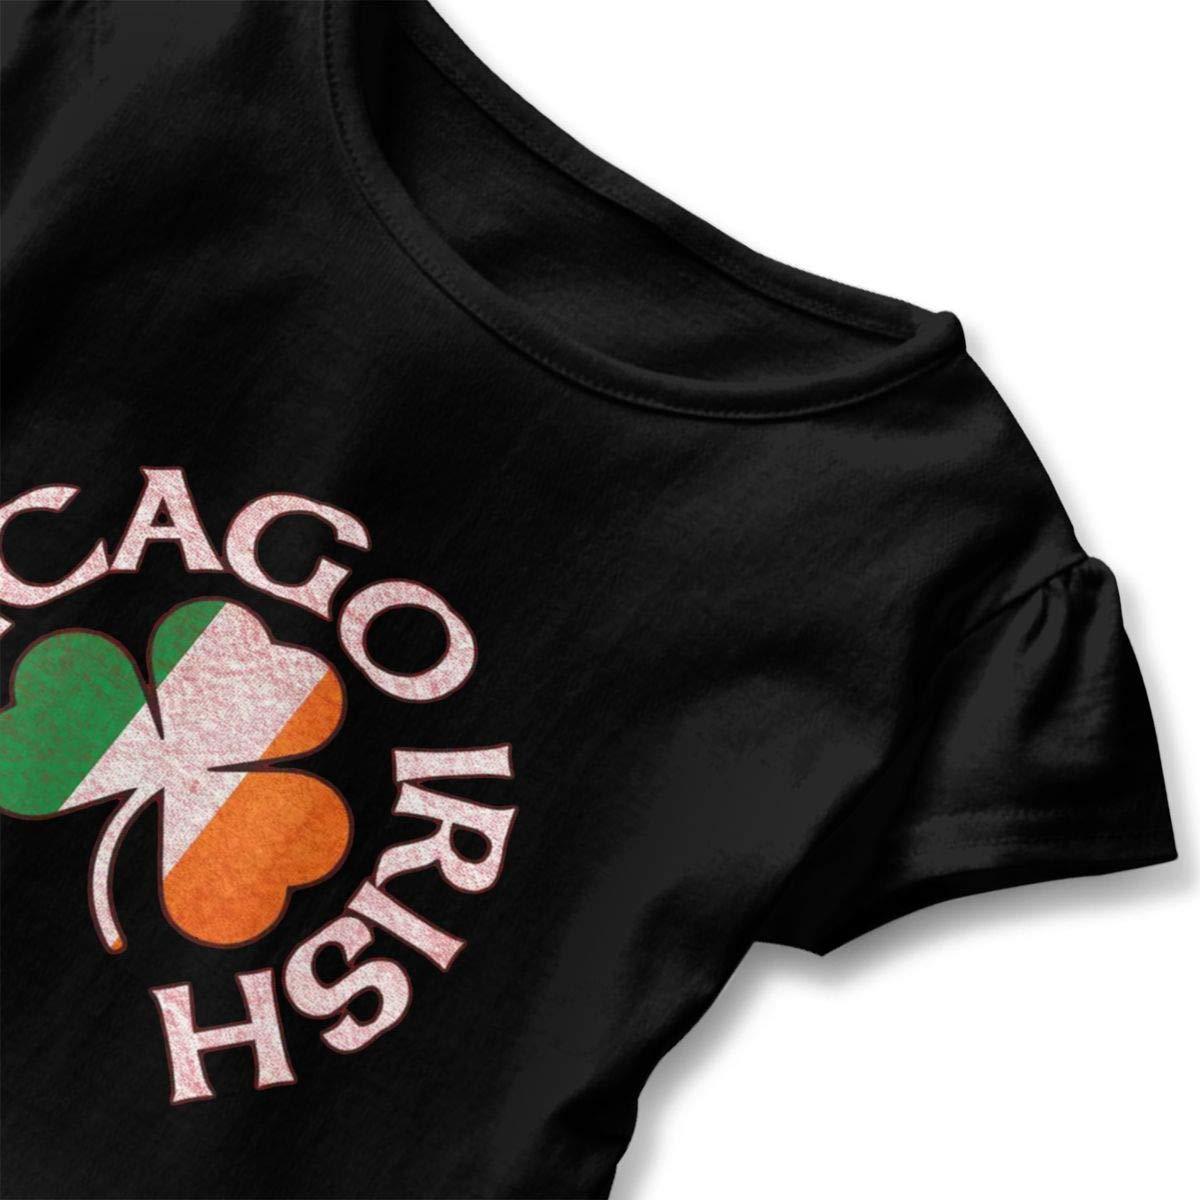 CZnuen Chicago Irish Shamrock 2-6T Baby Girls Cotton Jersey Short Sleeve Ruffle Tee